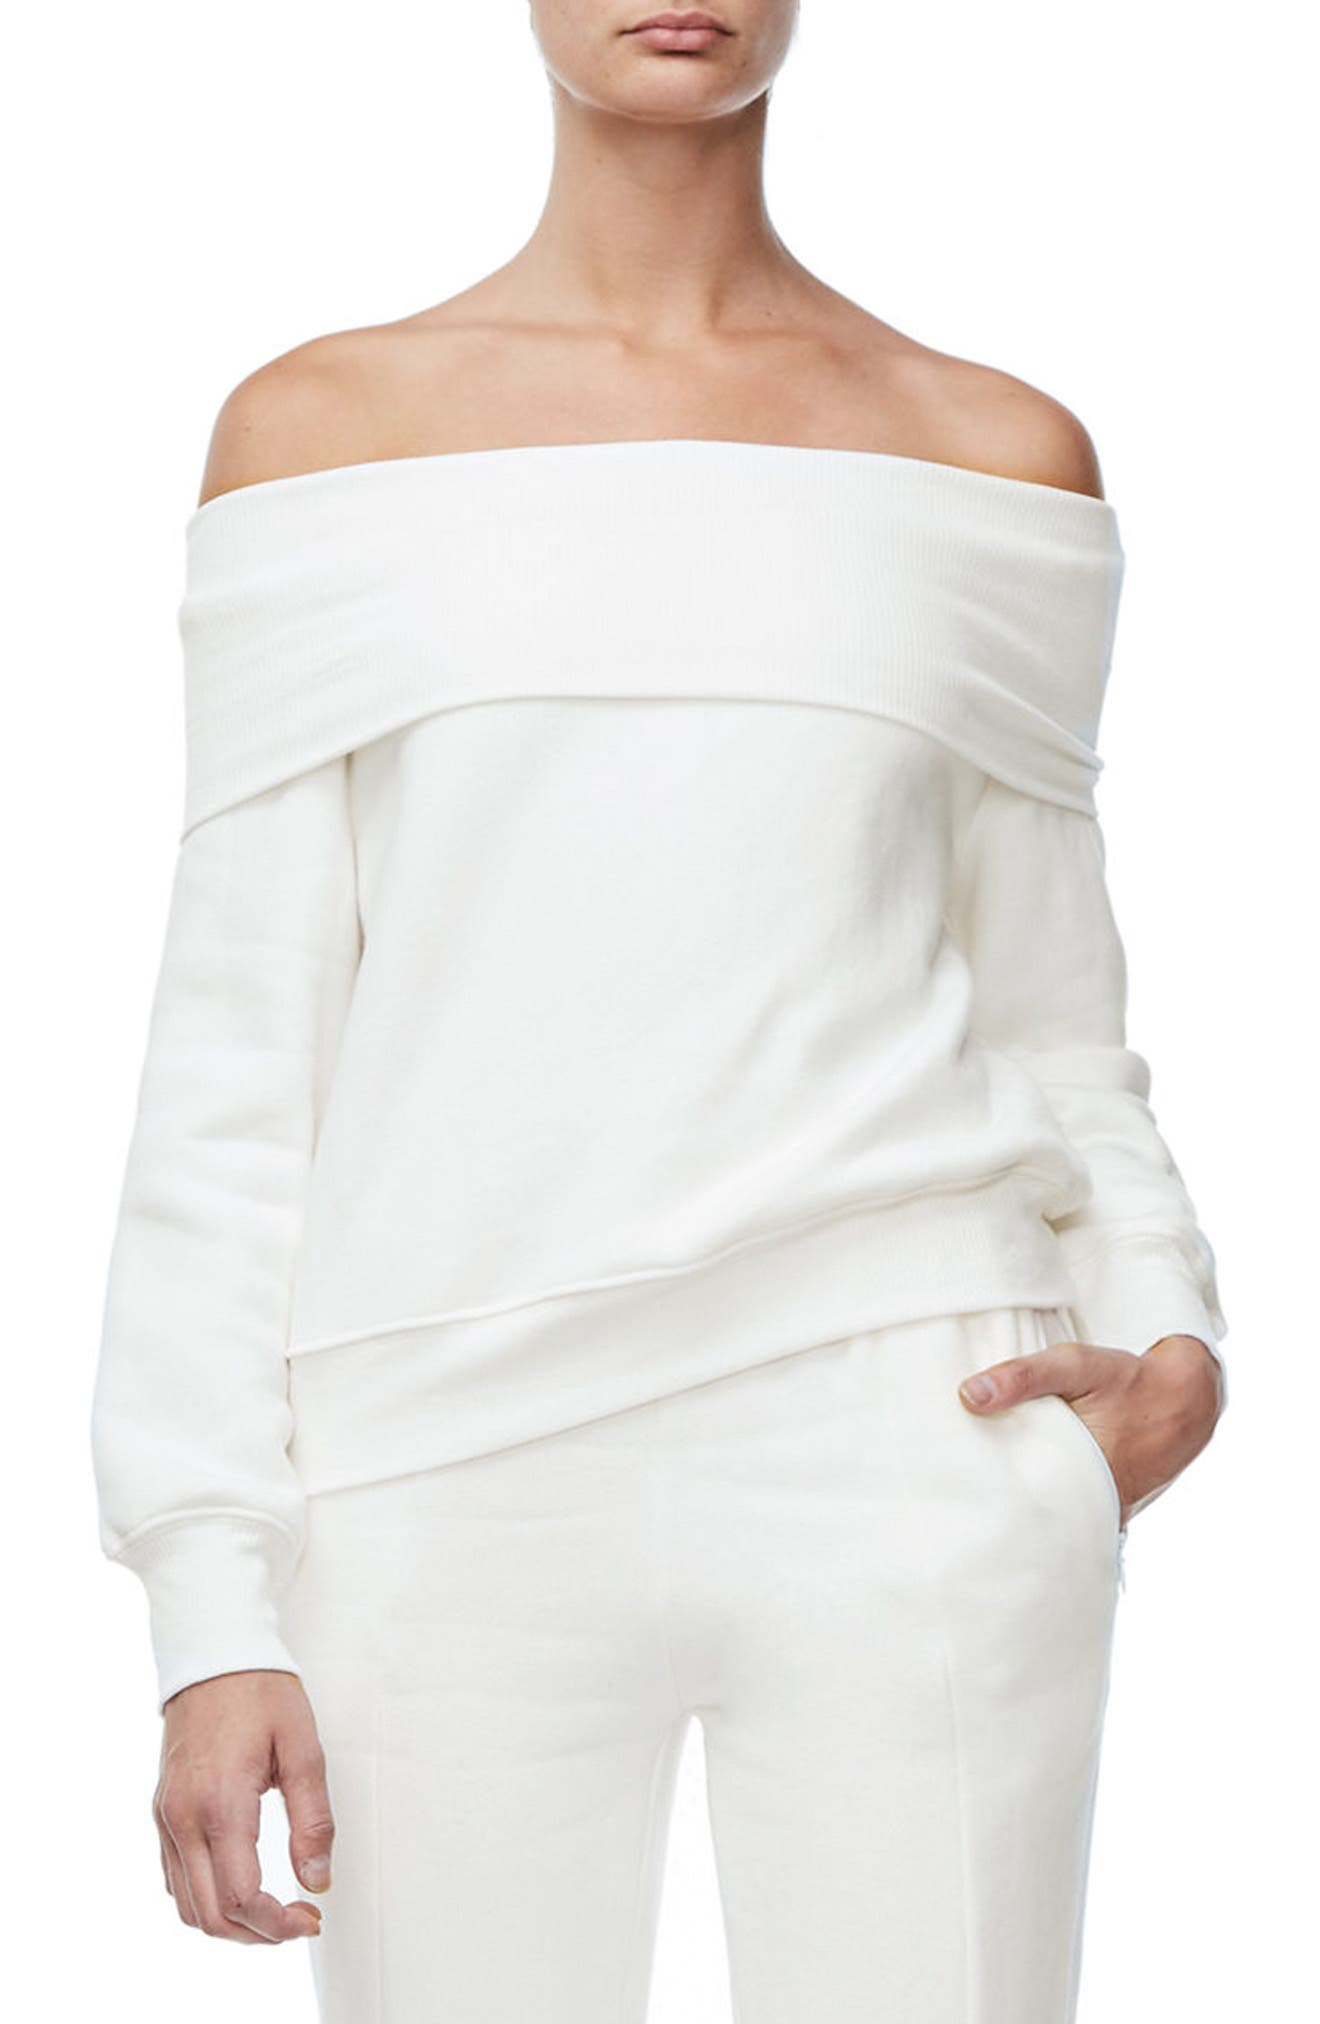 Main Image - Good American Good Sweats The Cold Shoulder Sweatshirt (Regular & Plus Size)